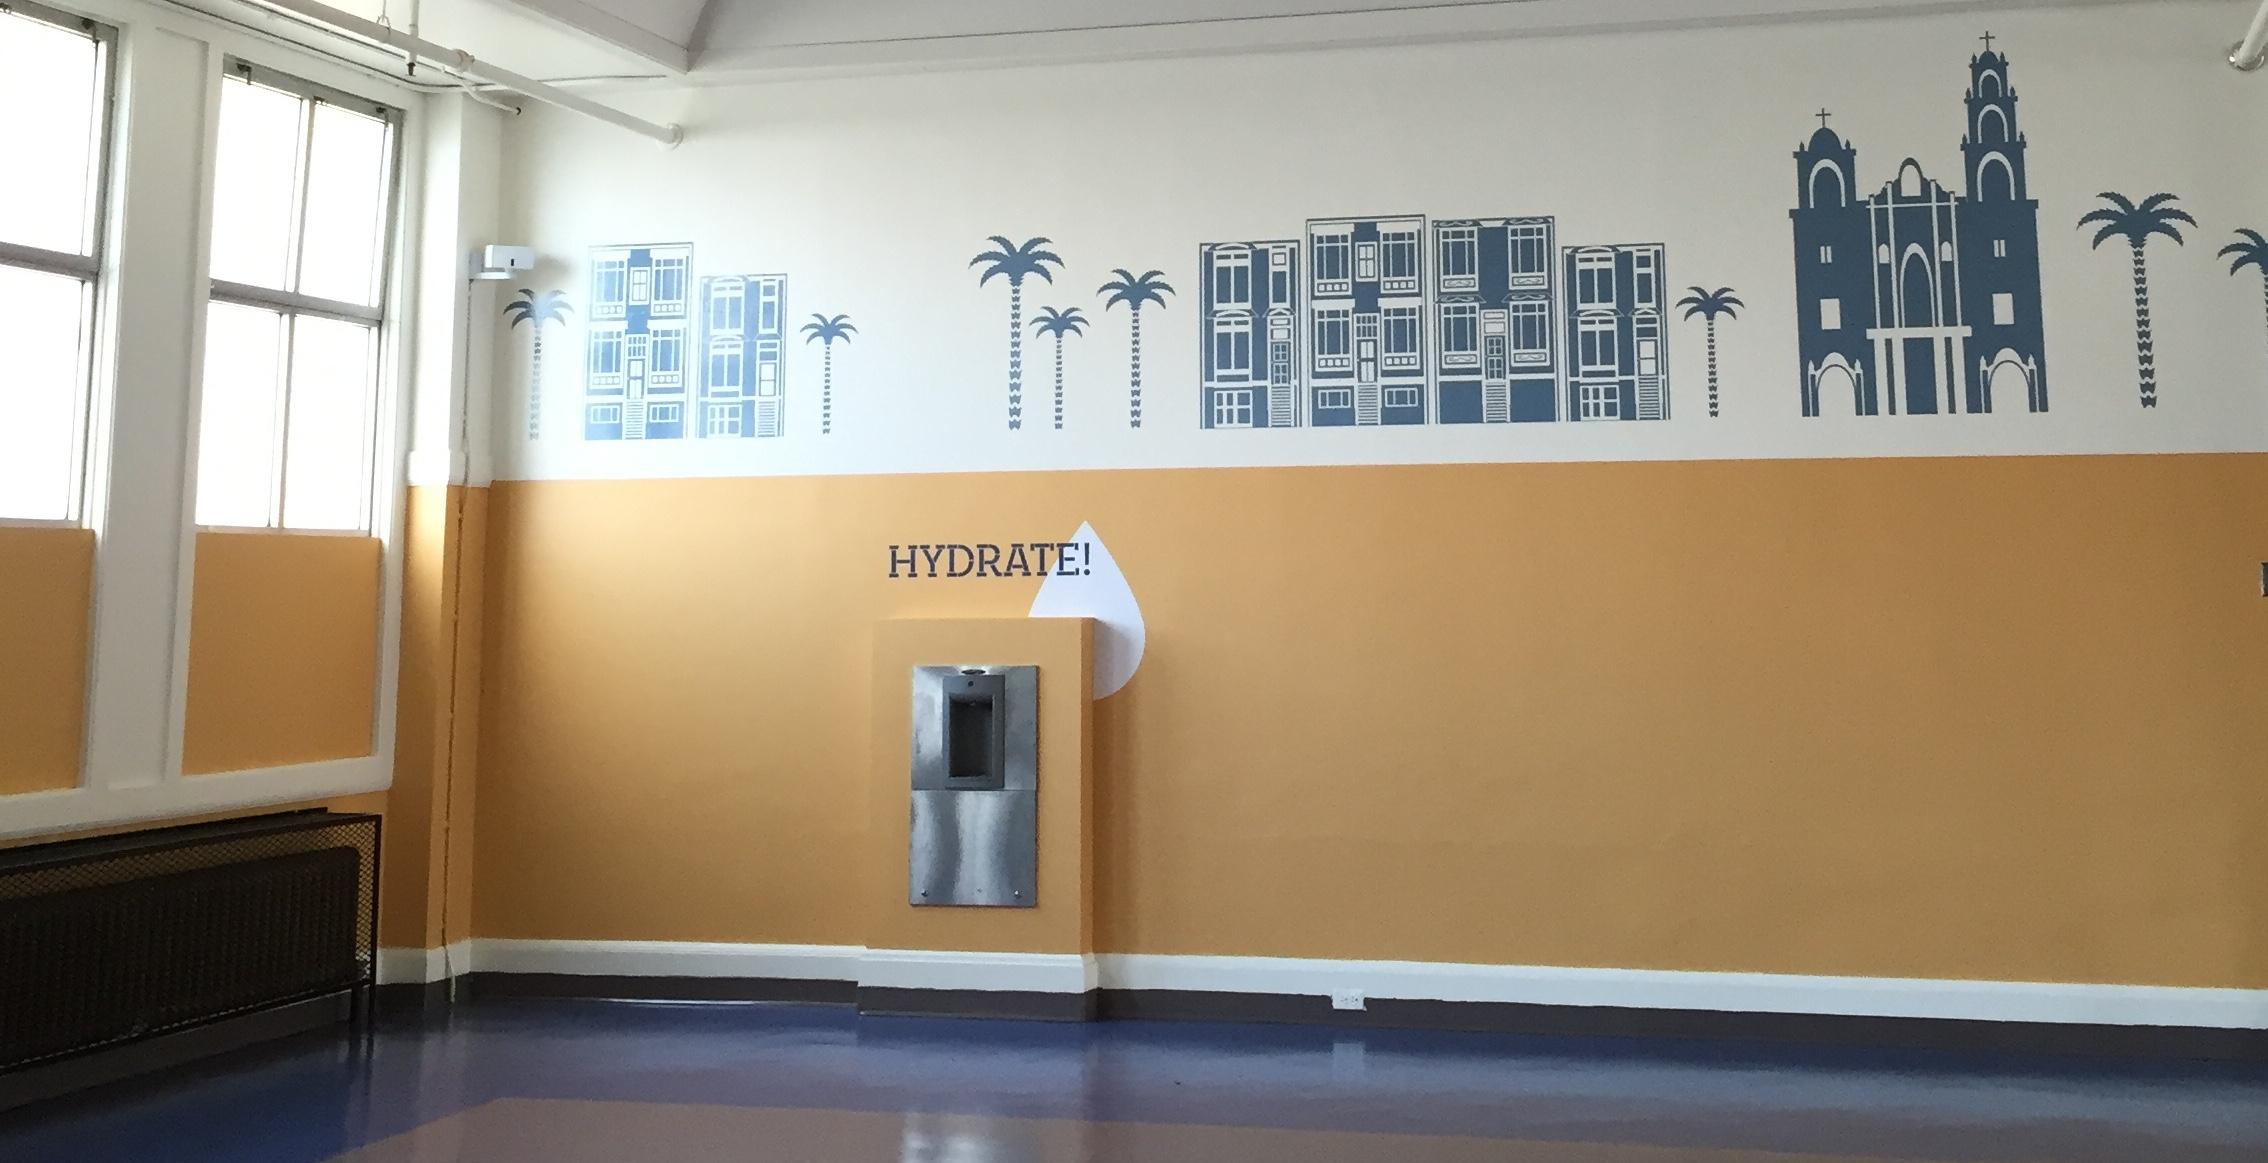 Everett_Install_hydrate1_150806.JPG